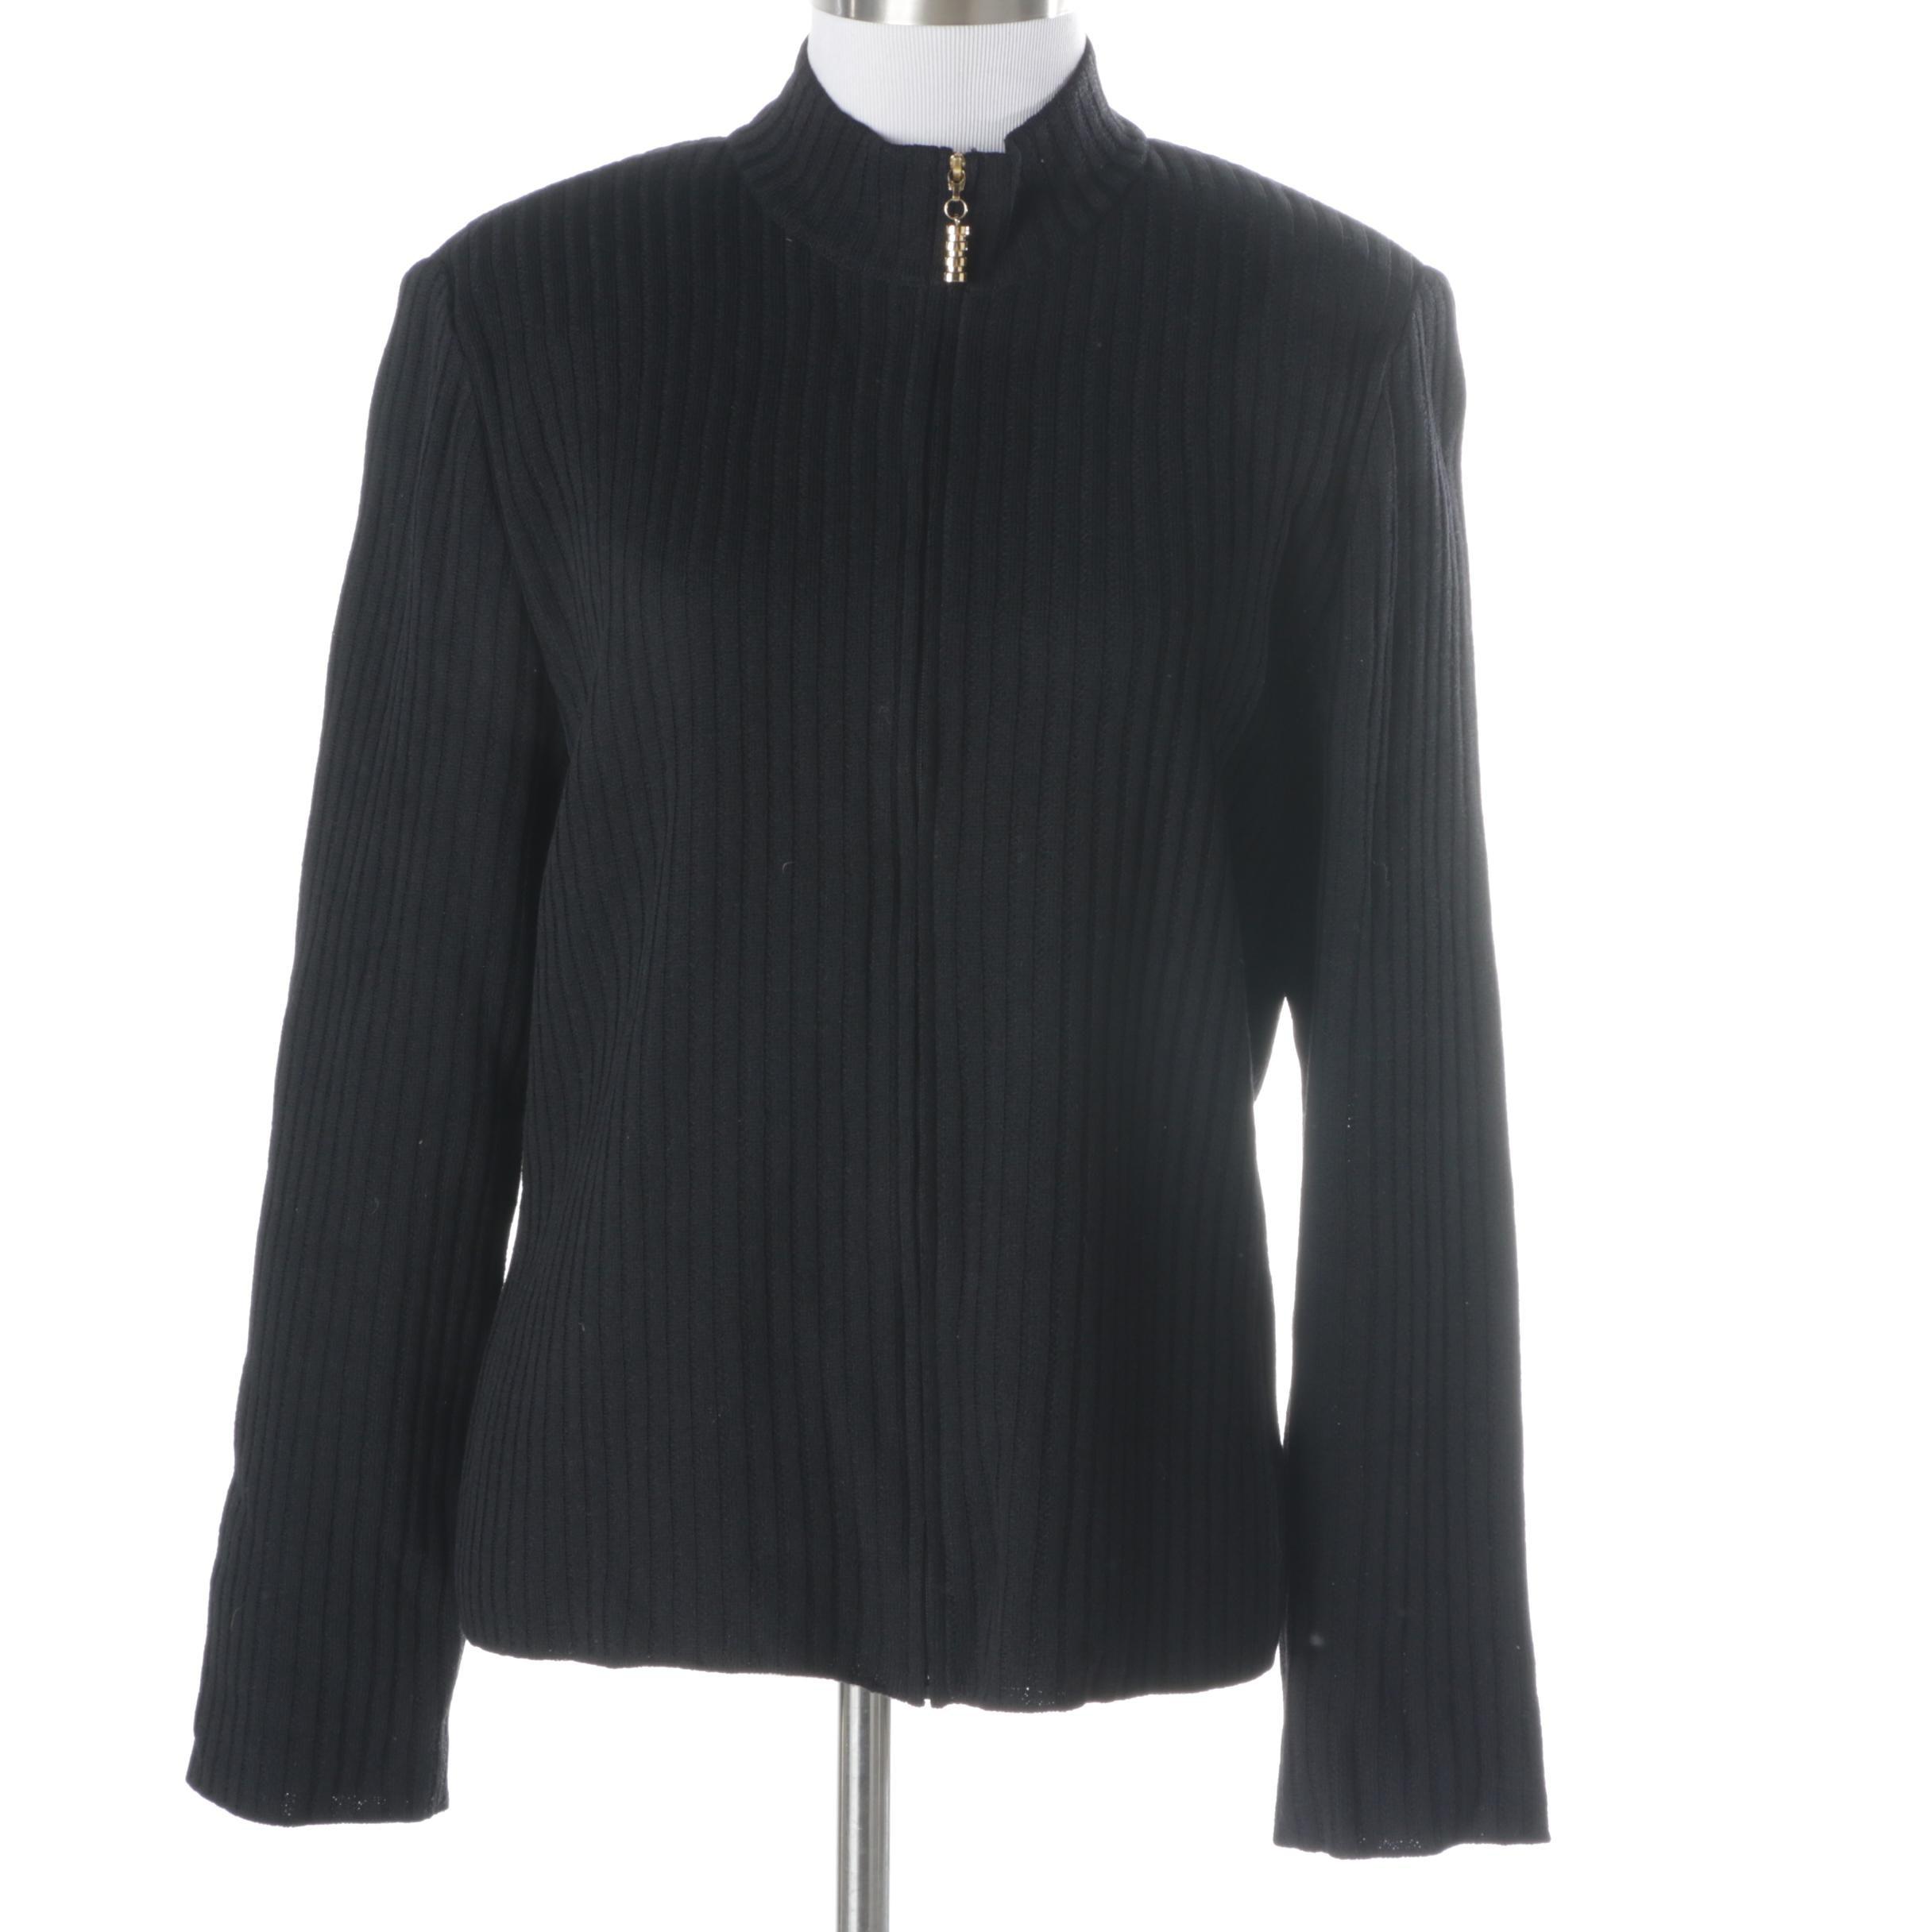 Women's St. John Black Sweater